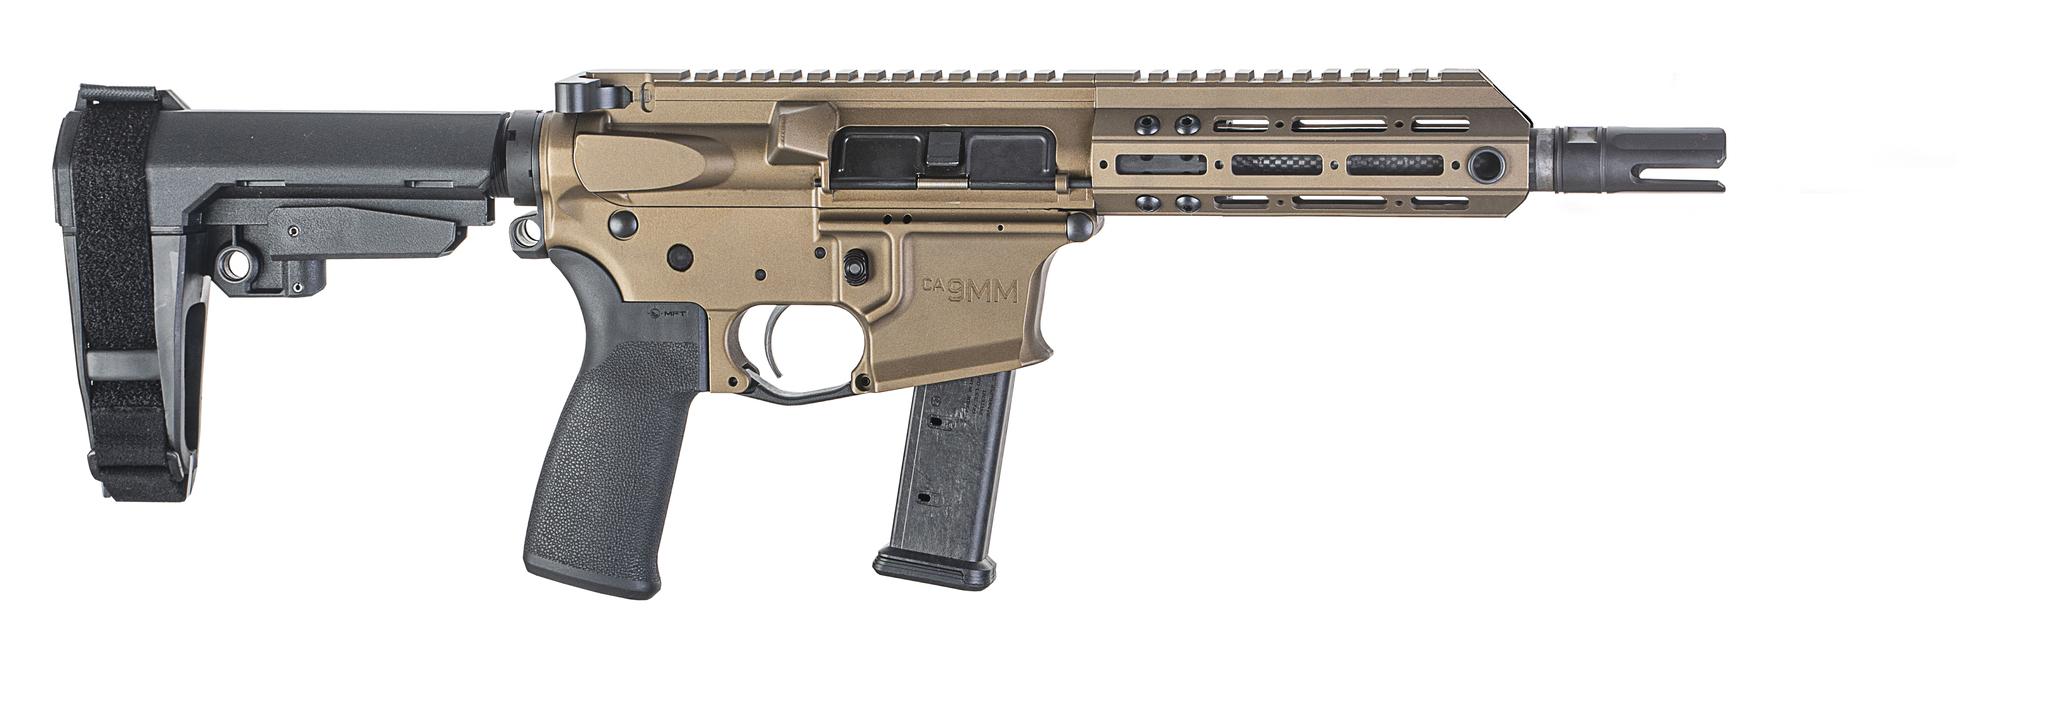 Christensen Arms CA9MM 9mm